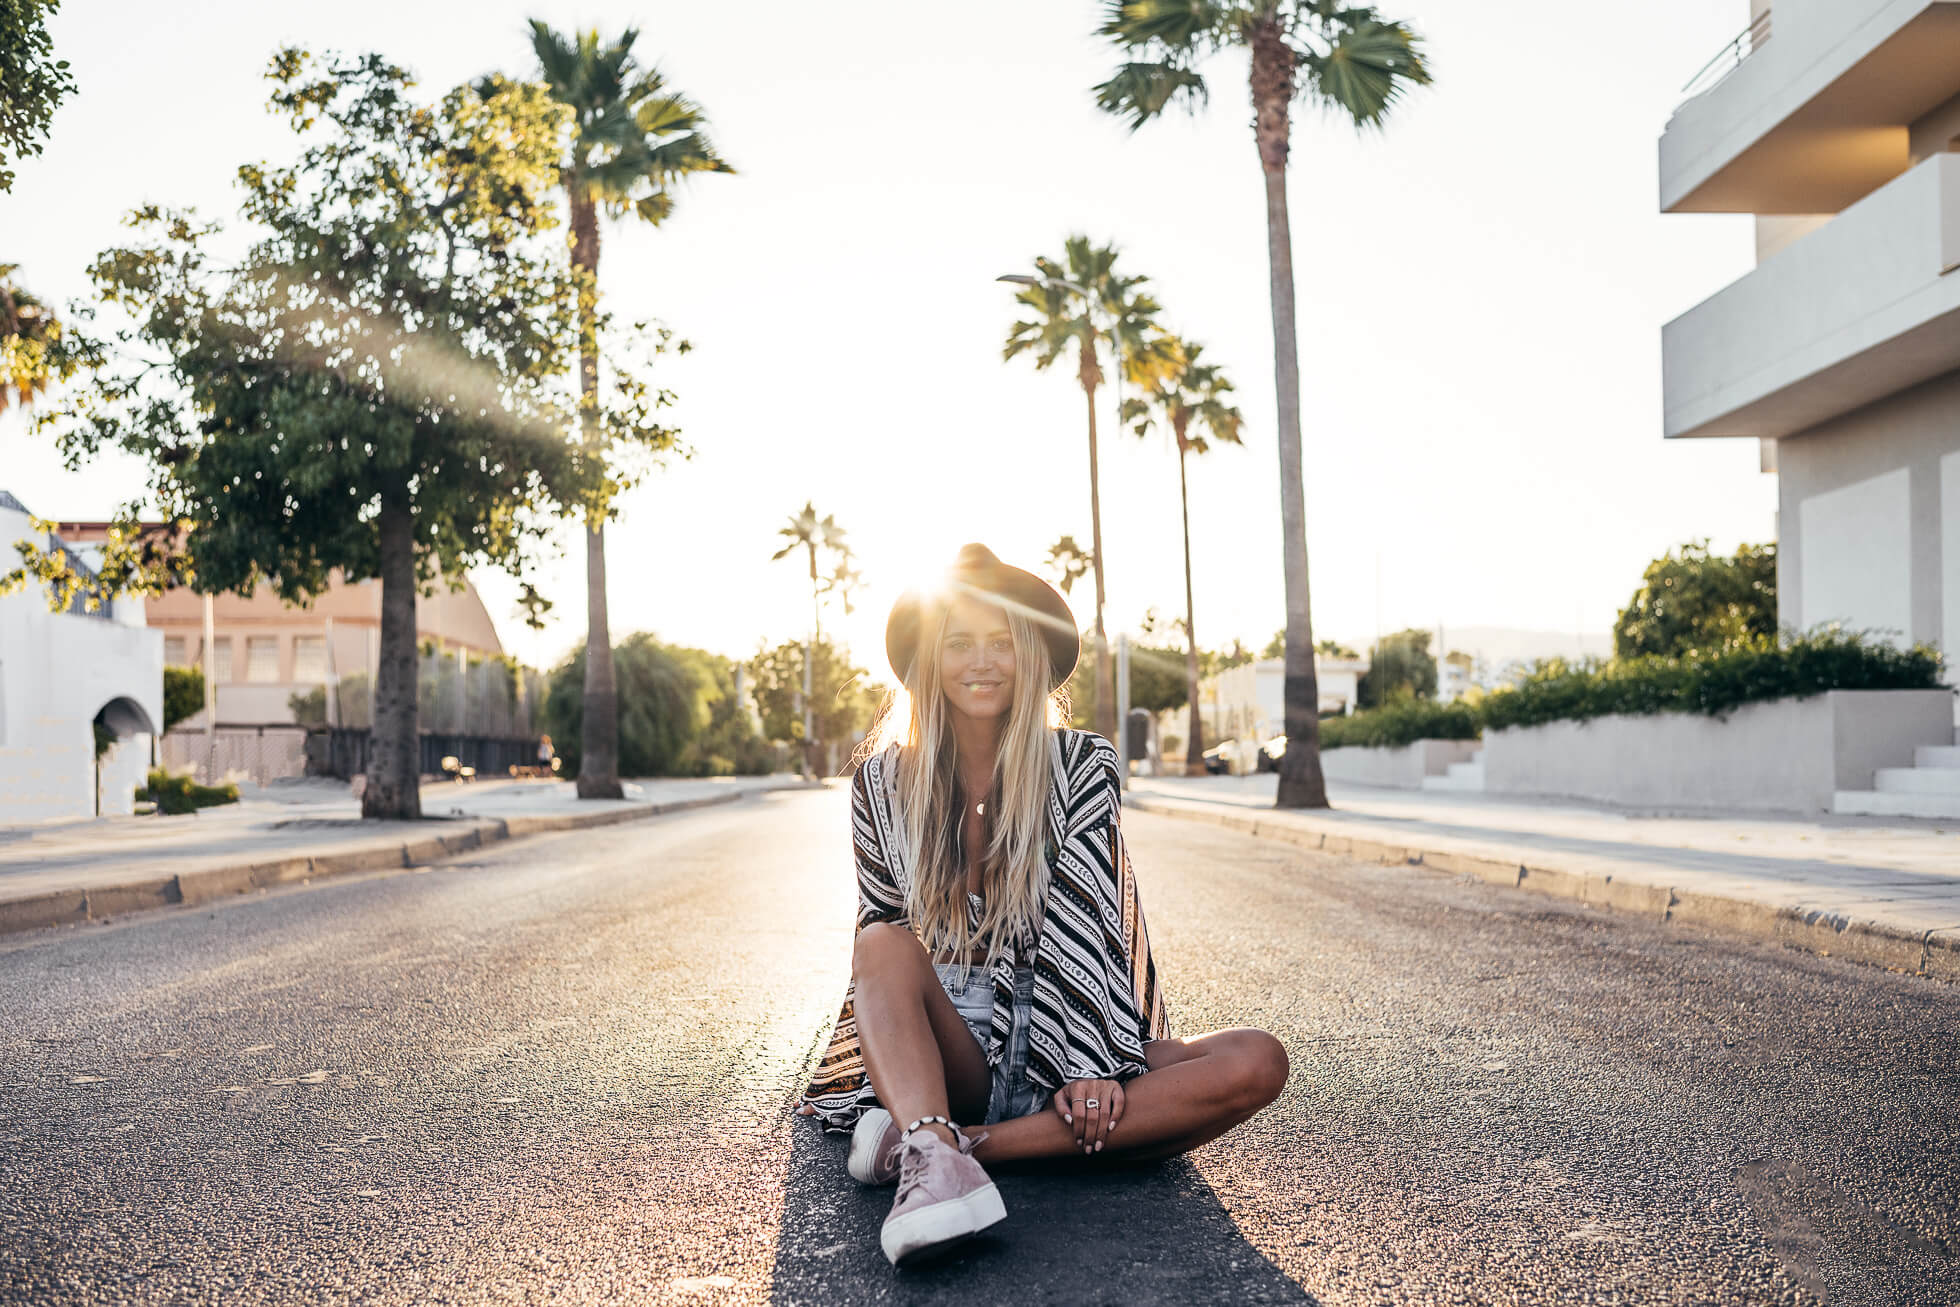 janni-deler-sunset-momentsJ1180340-Redigera